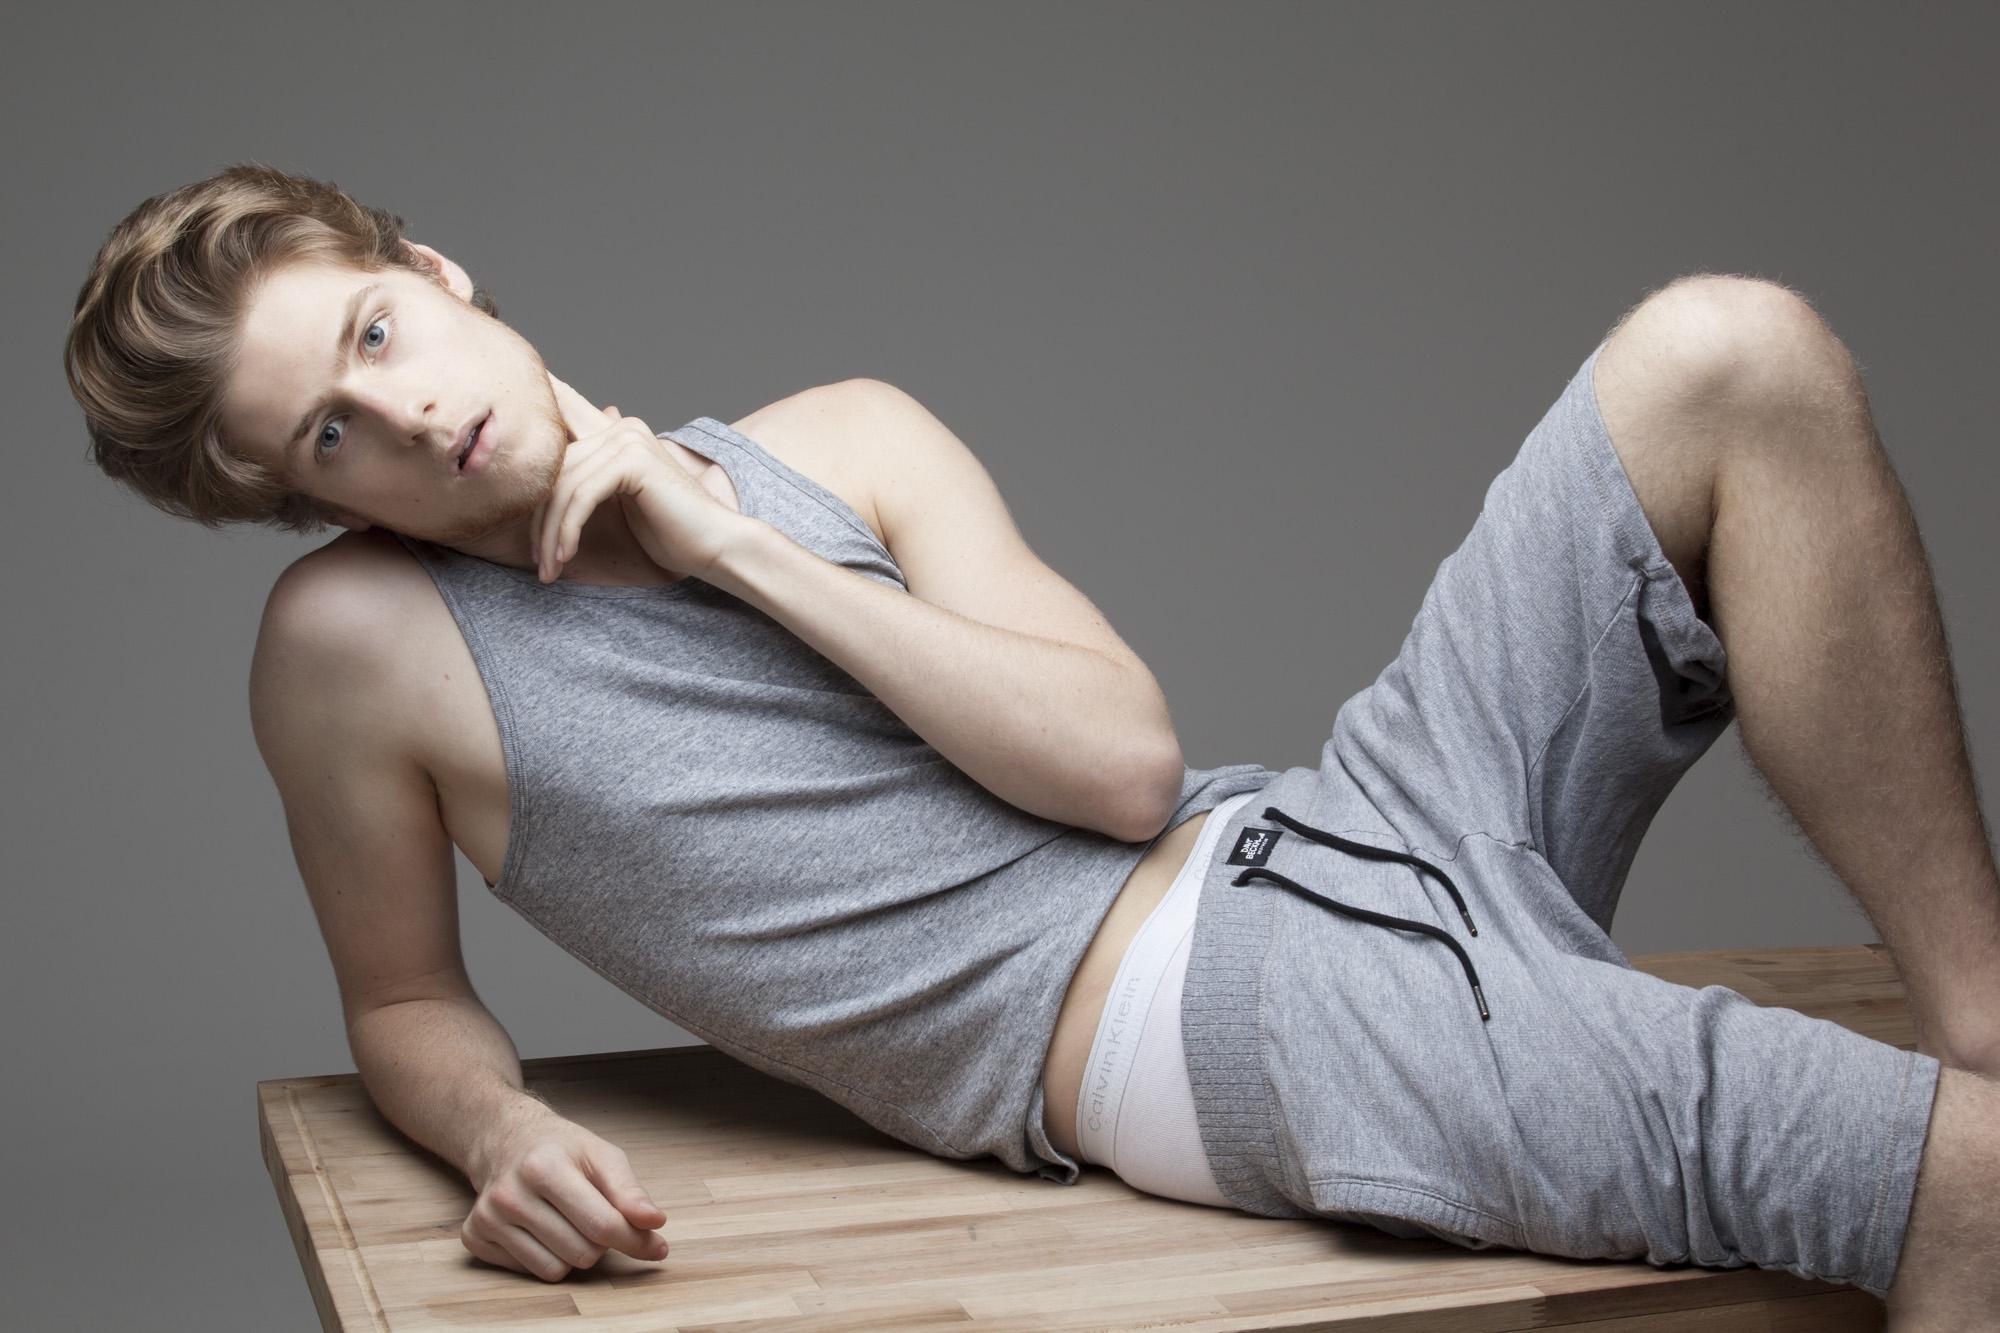 Matheus Fini by Xavier Samré - Fashionably Male